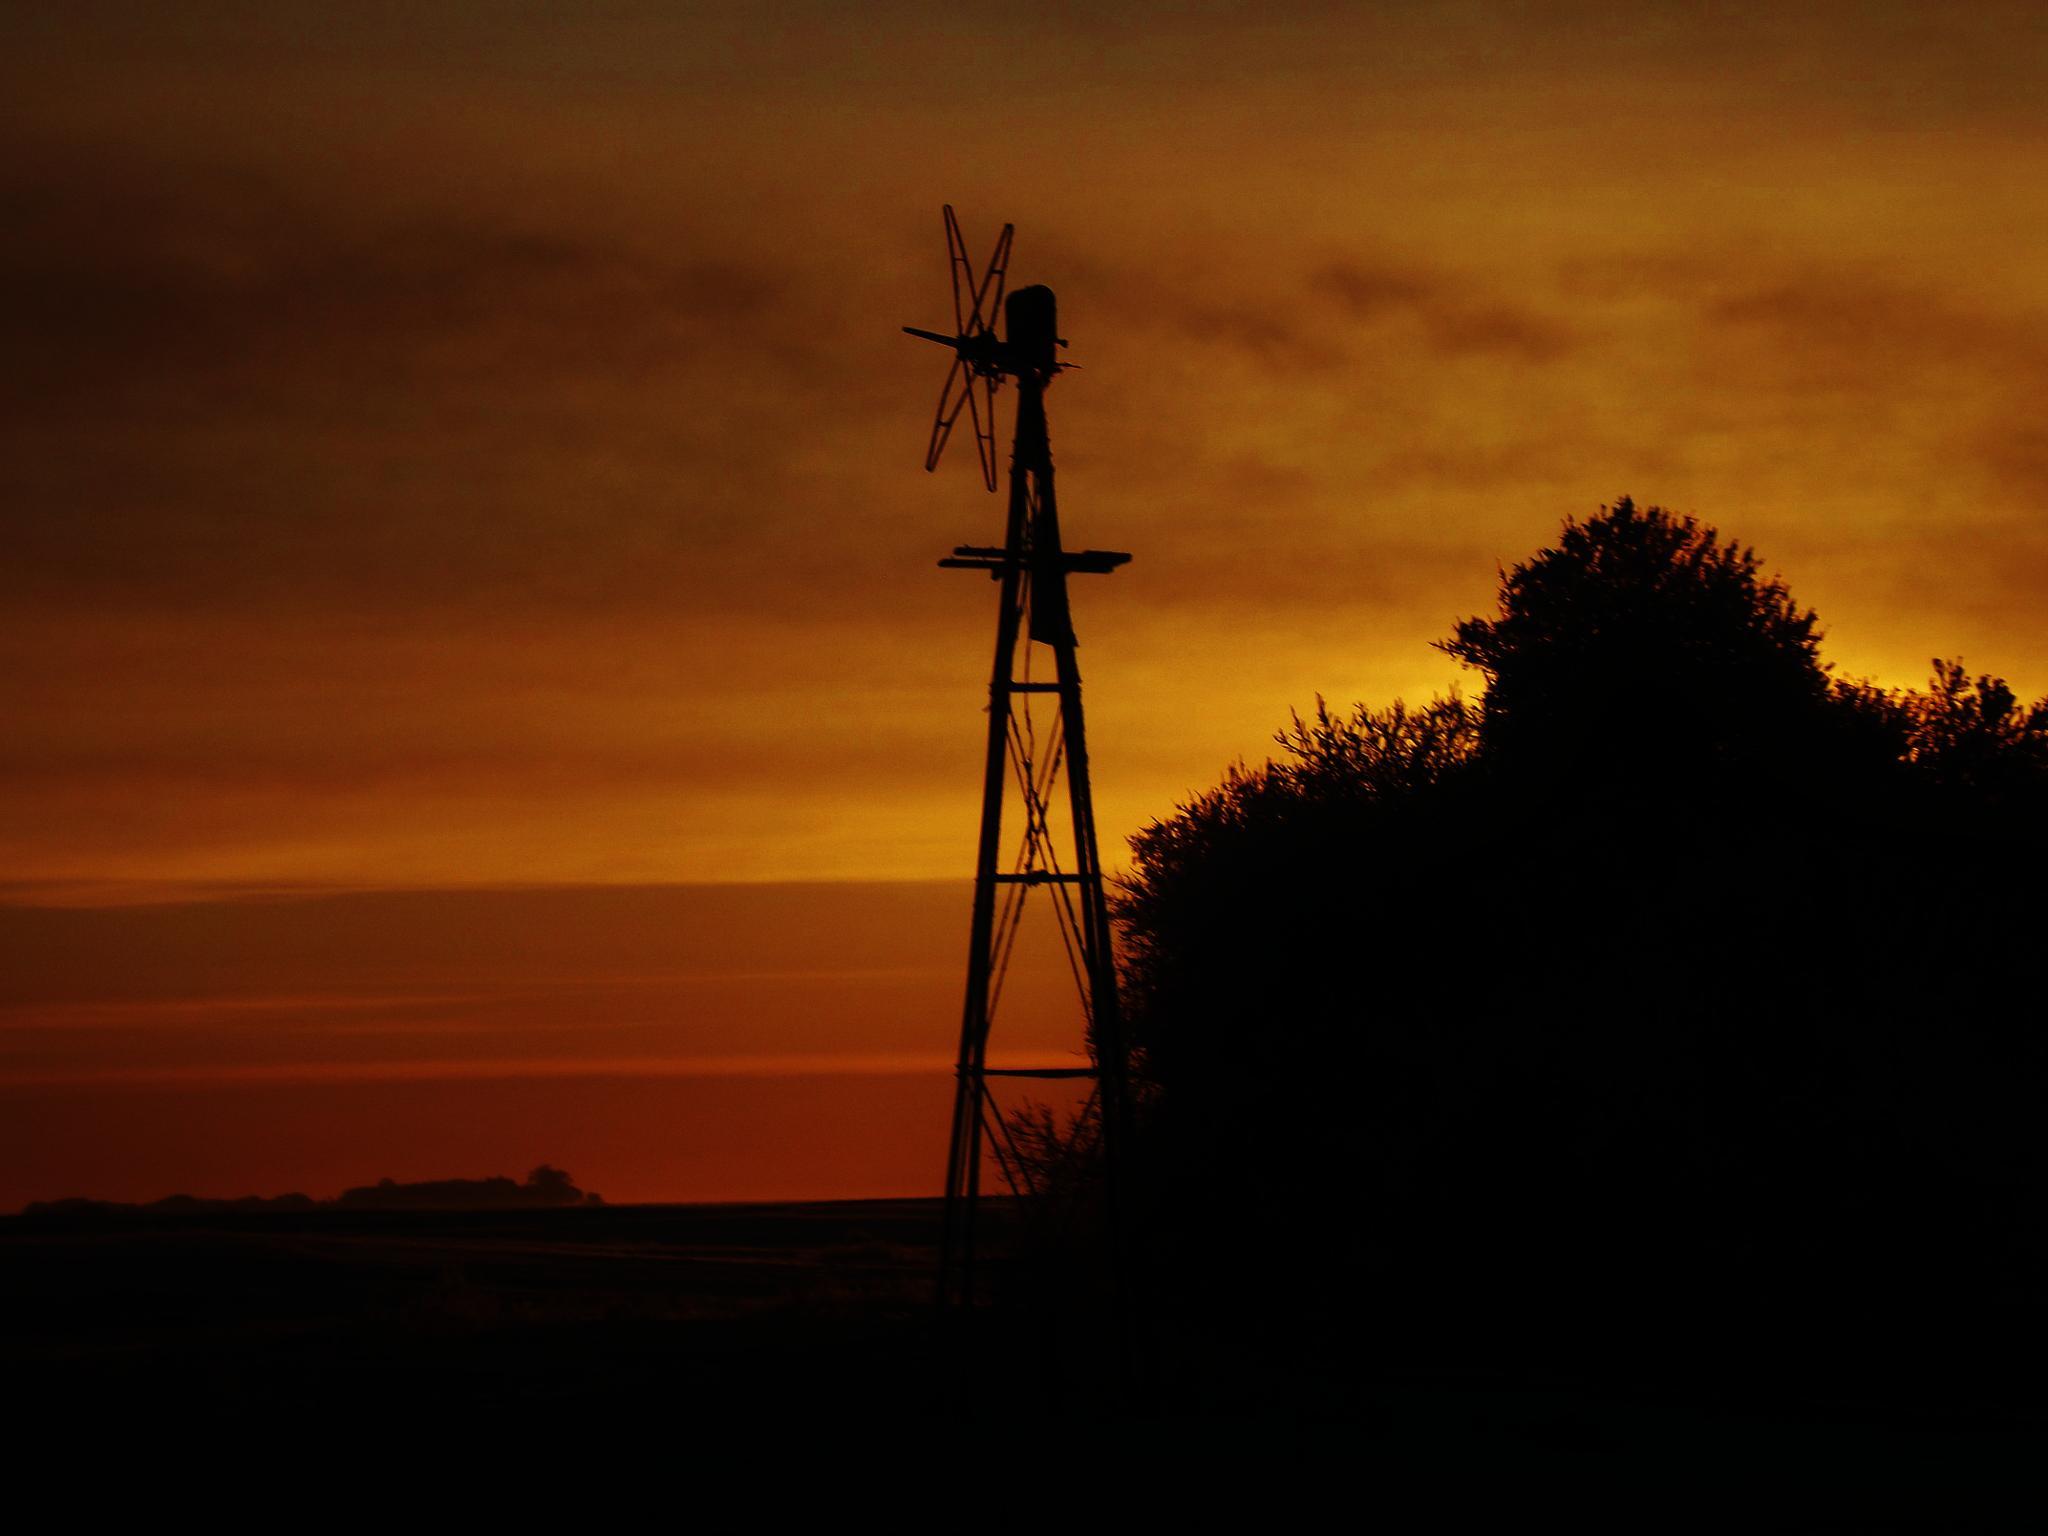 sunrise on a thursday - what my third eye saw by Rhyland Cottingham